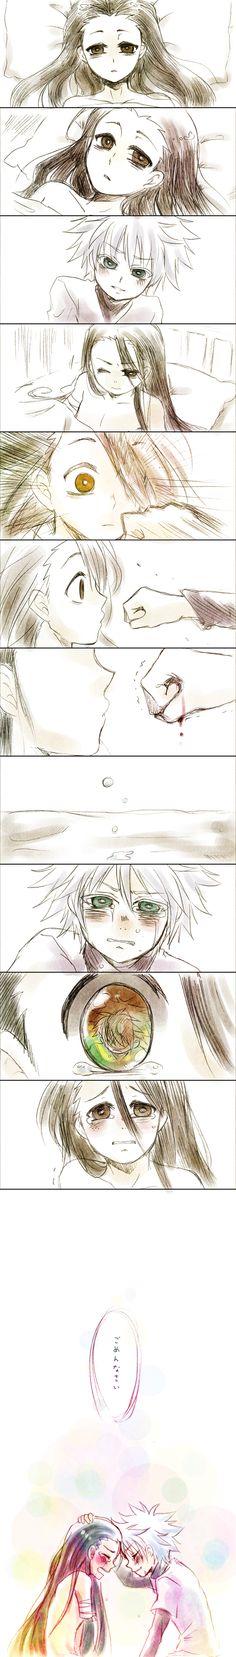 Gon Freecs and killua zoldyck very sad Hunter x Hunter Hisoka, Alluka Zoldyck, Gon Killua, Manga Anime, Sad Anime, Anime Art, Hunter X Hunter, Super Anime, Image Manga